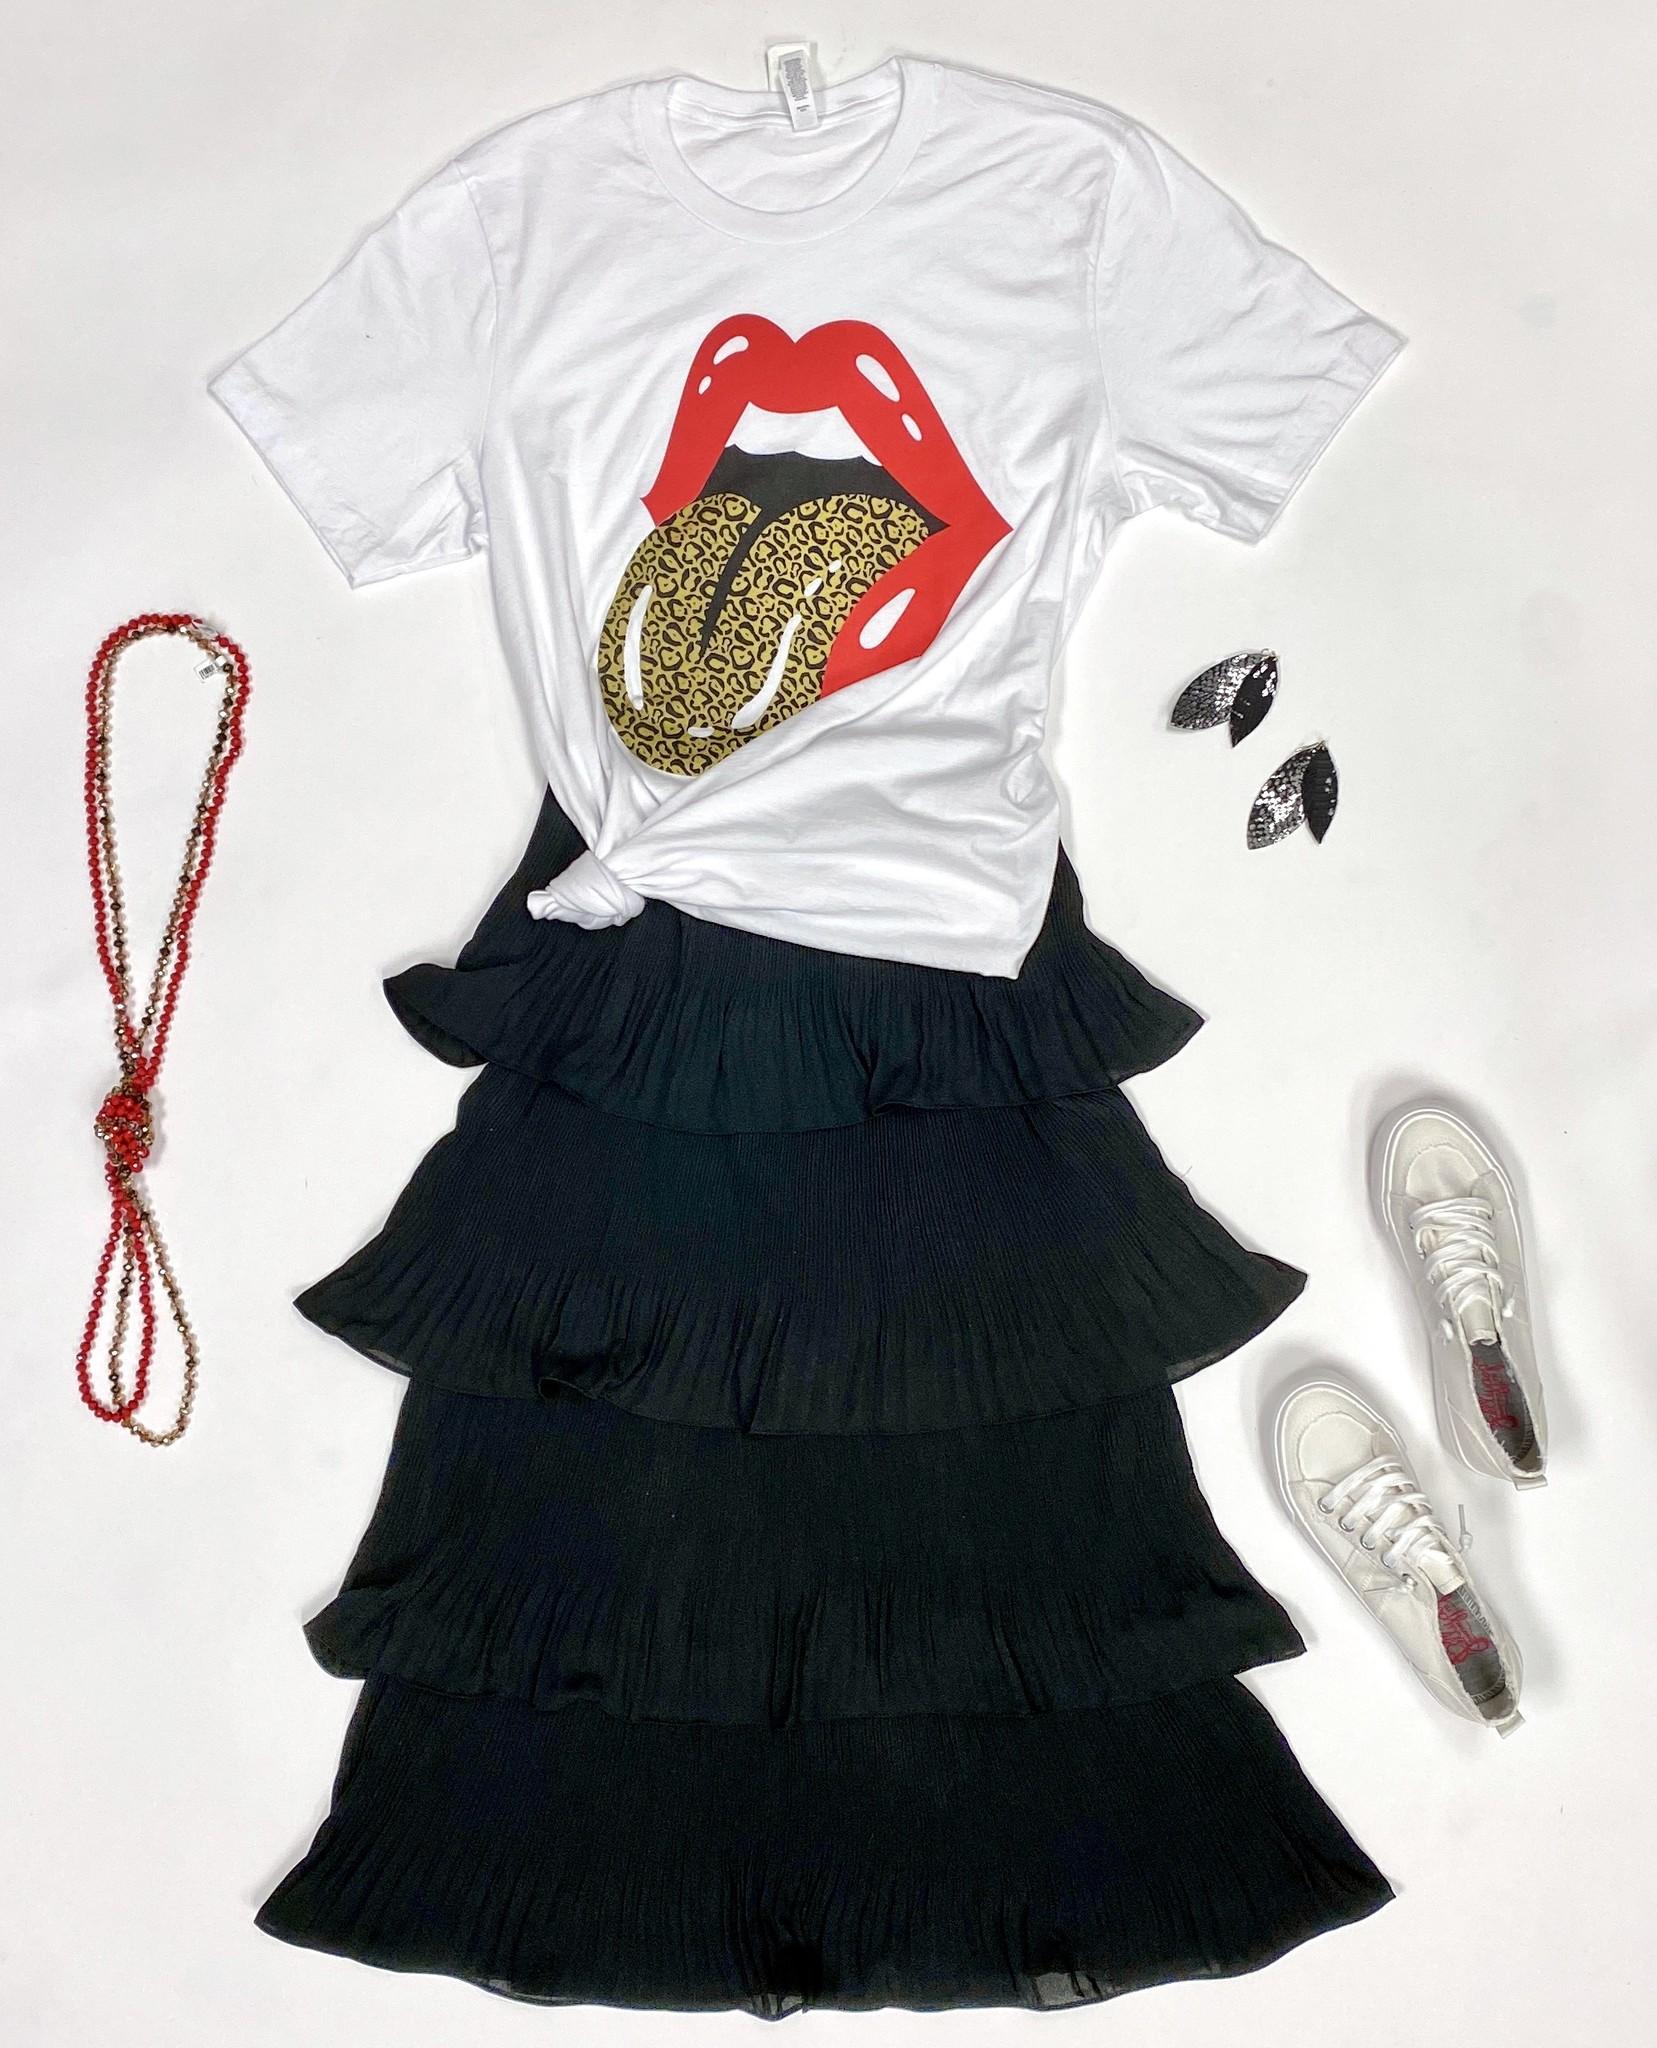 """Leopard Rolling Stones"" T-shirt"